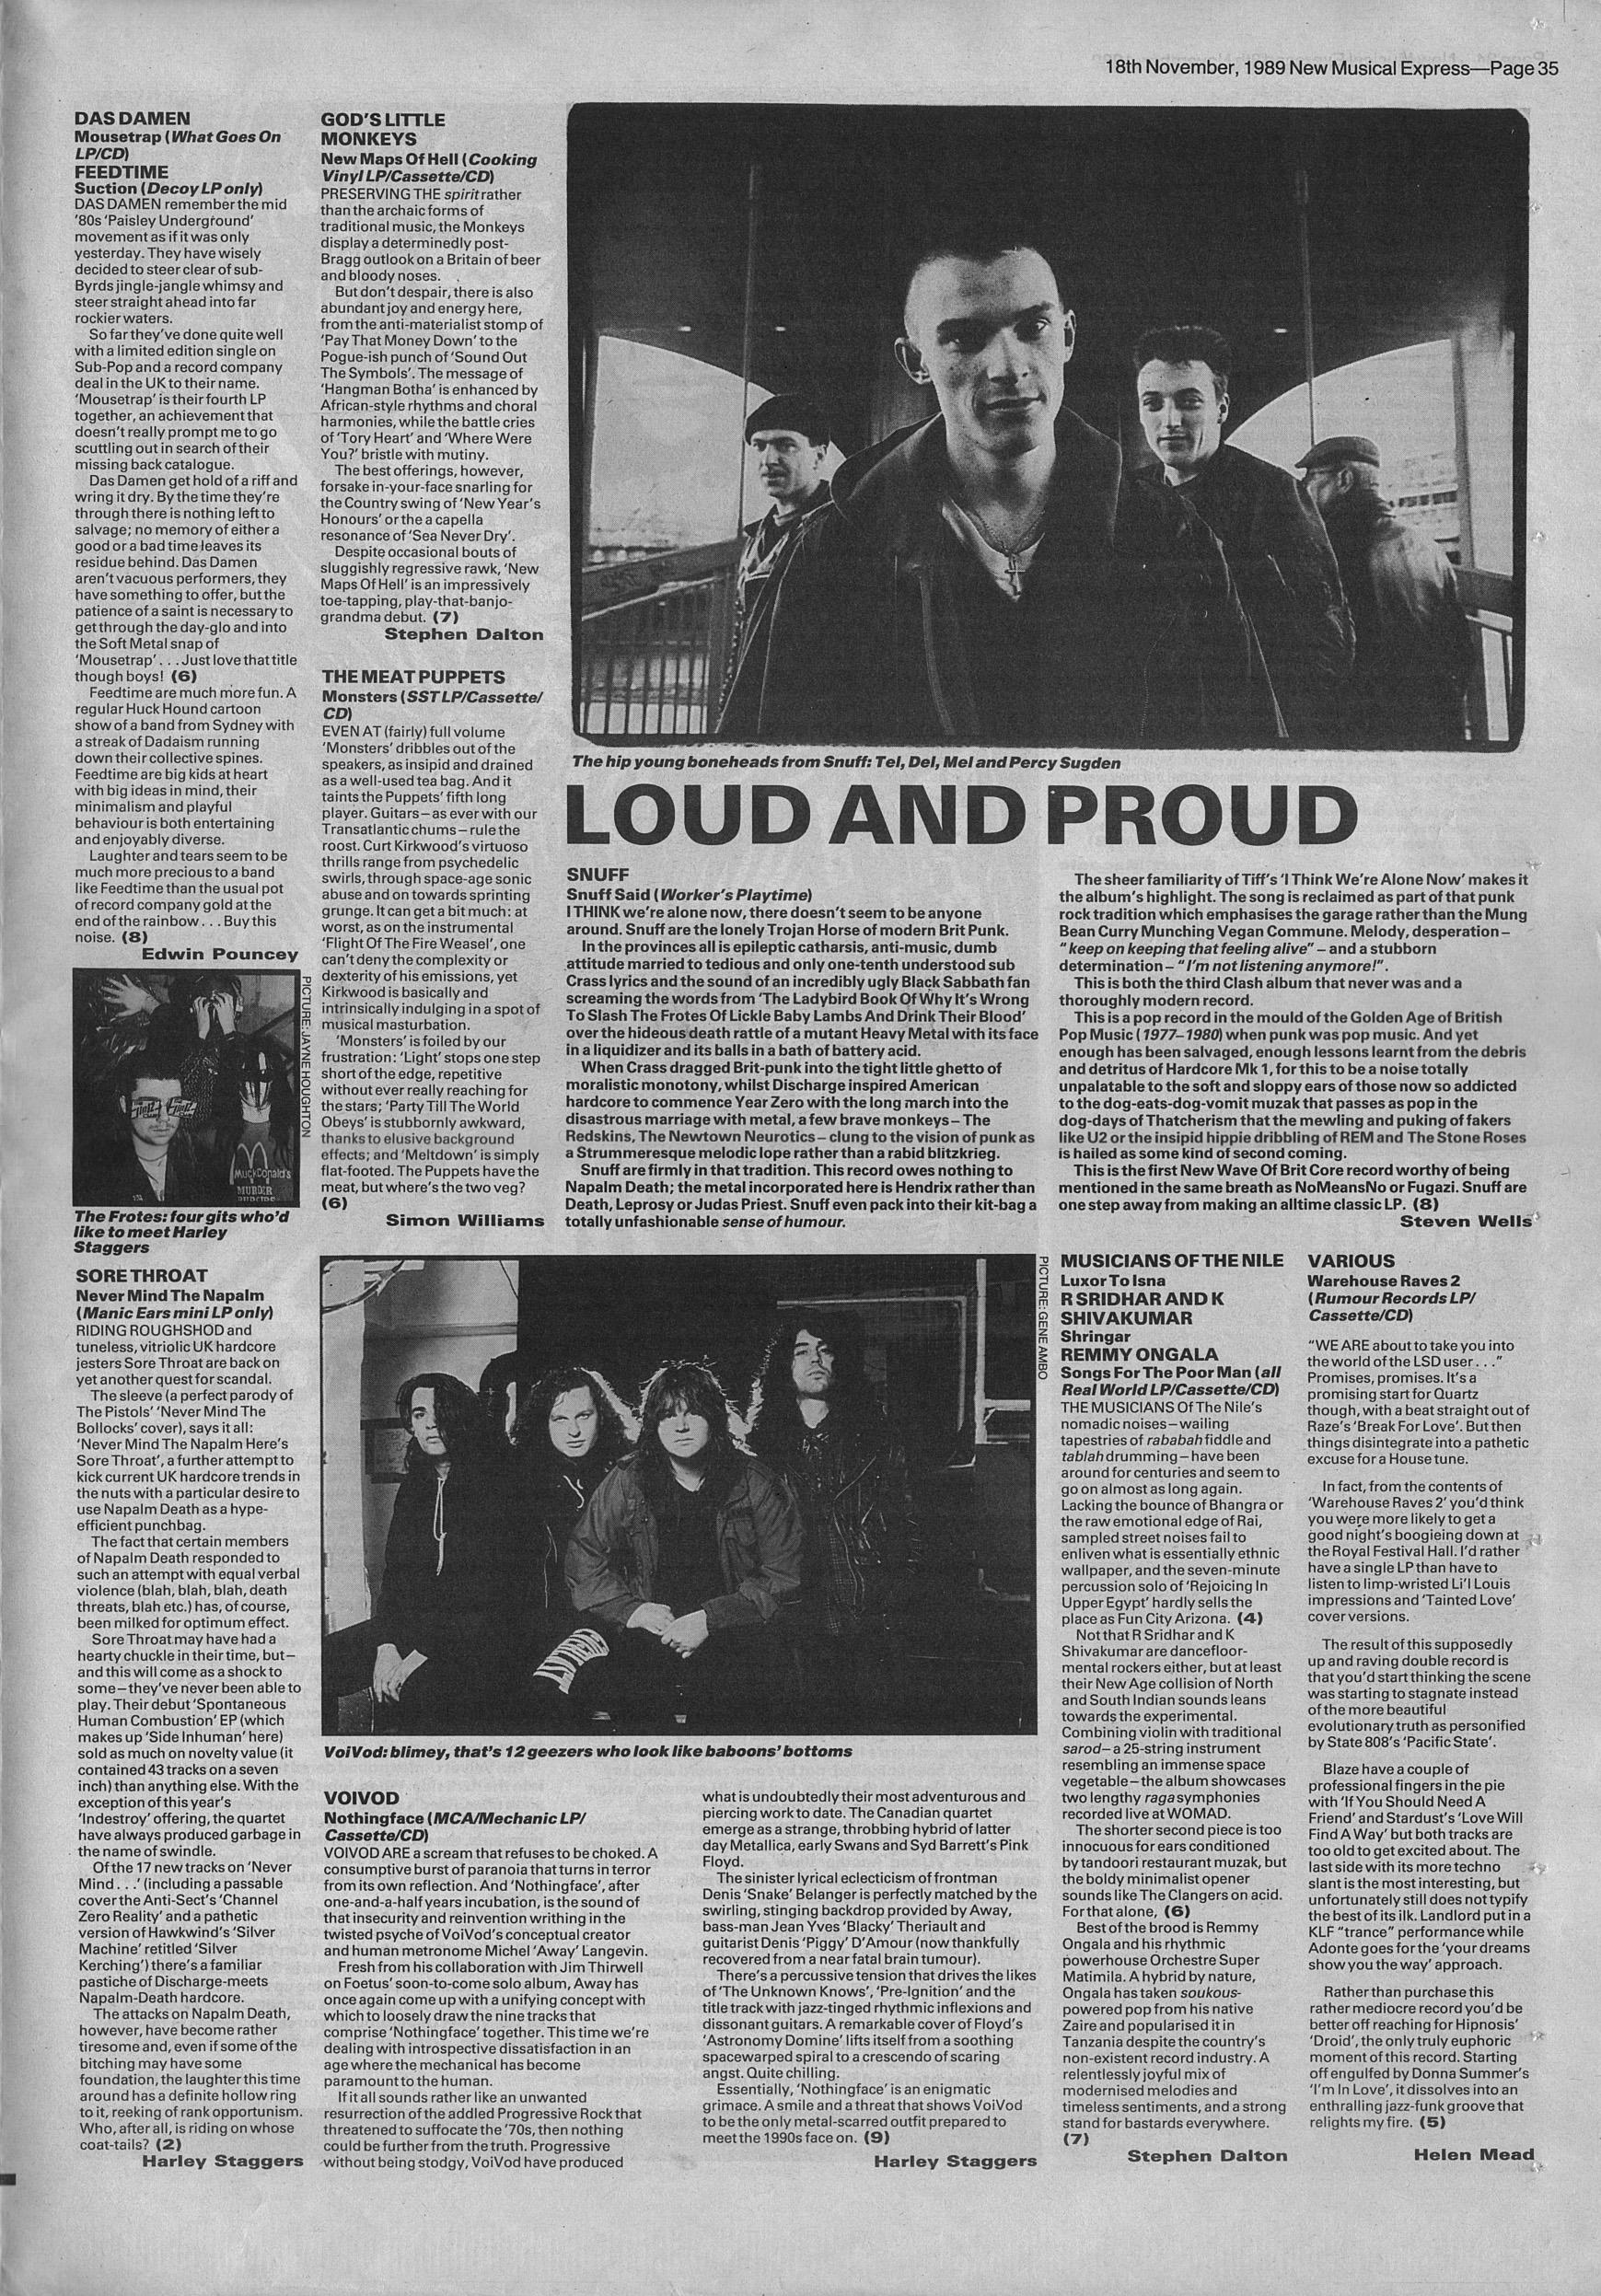 Steven Wells reviews Snuff Said by Snuff, 18th Novemeber 1989